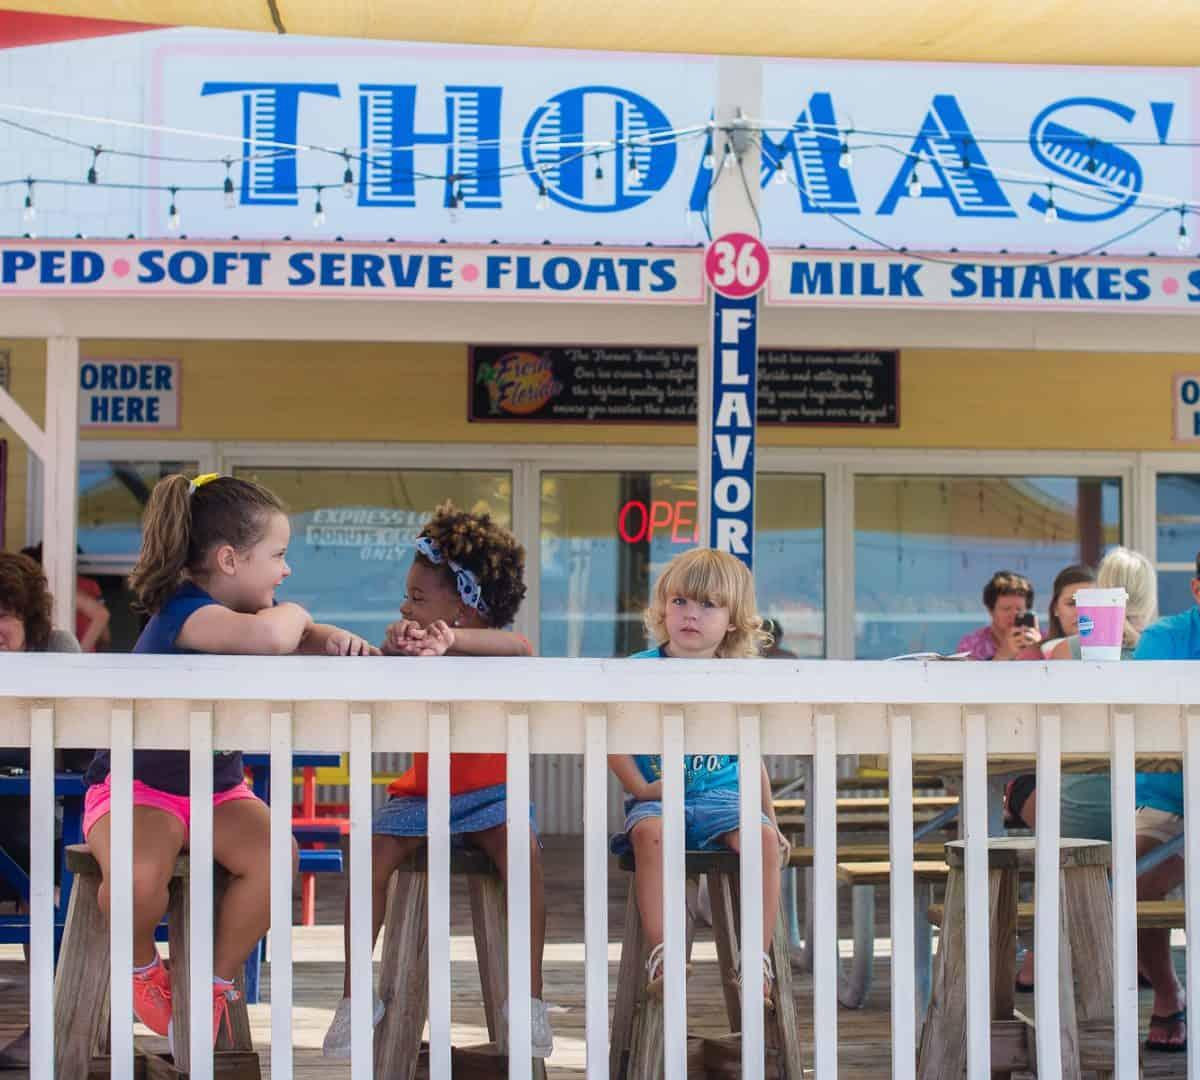 things-to-do-in-panama-city-beach-daily-mom-parents-portal-things-to-do-in-panama-city-beach-fl